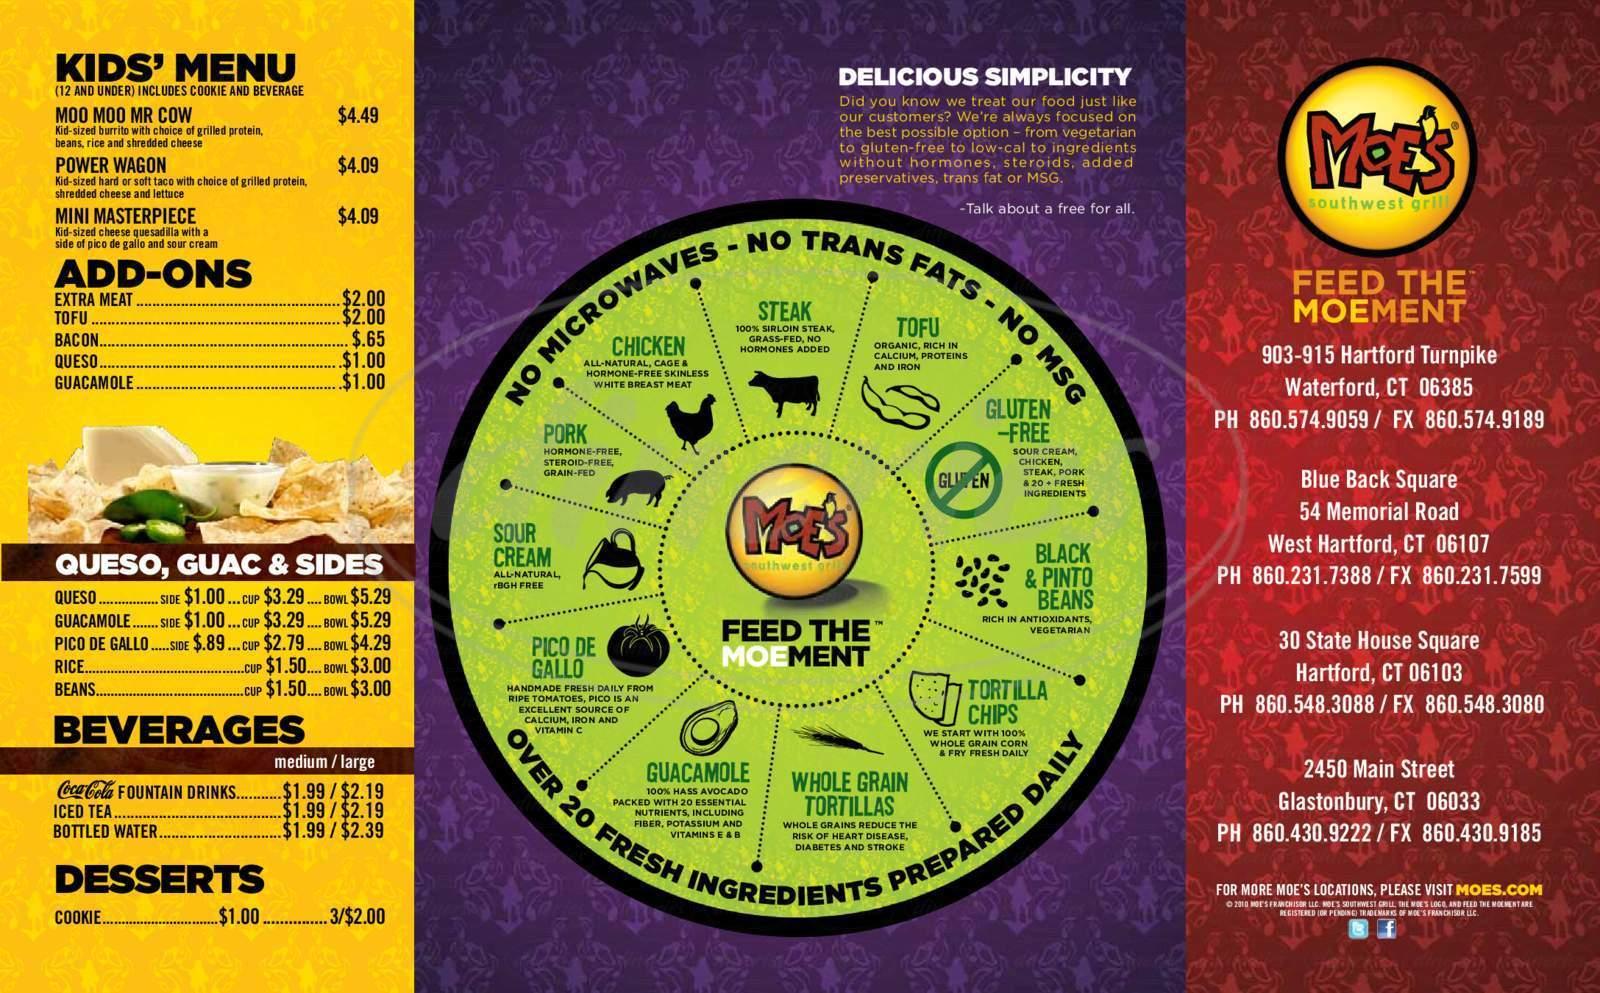 menu for Moe's Southwest Grill